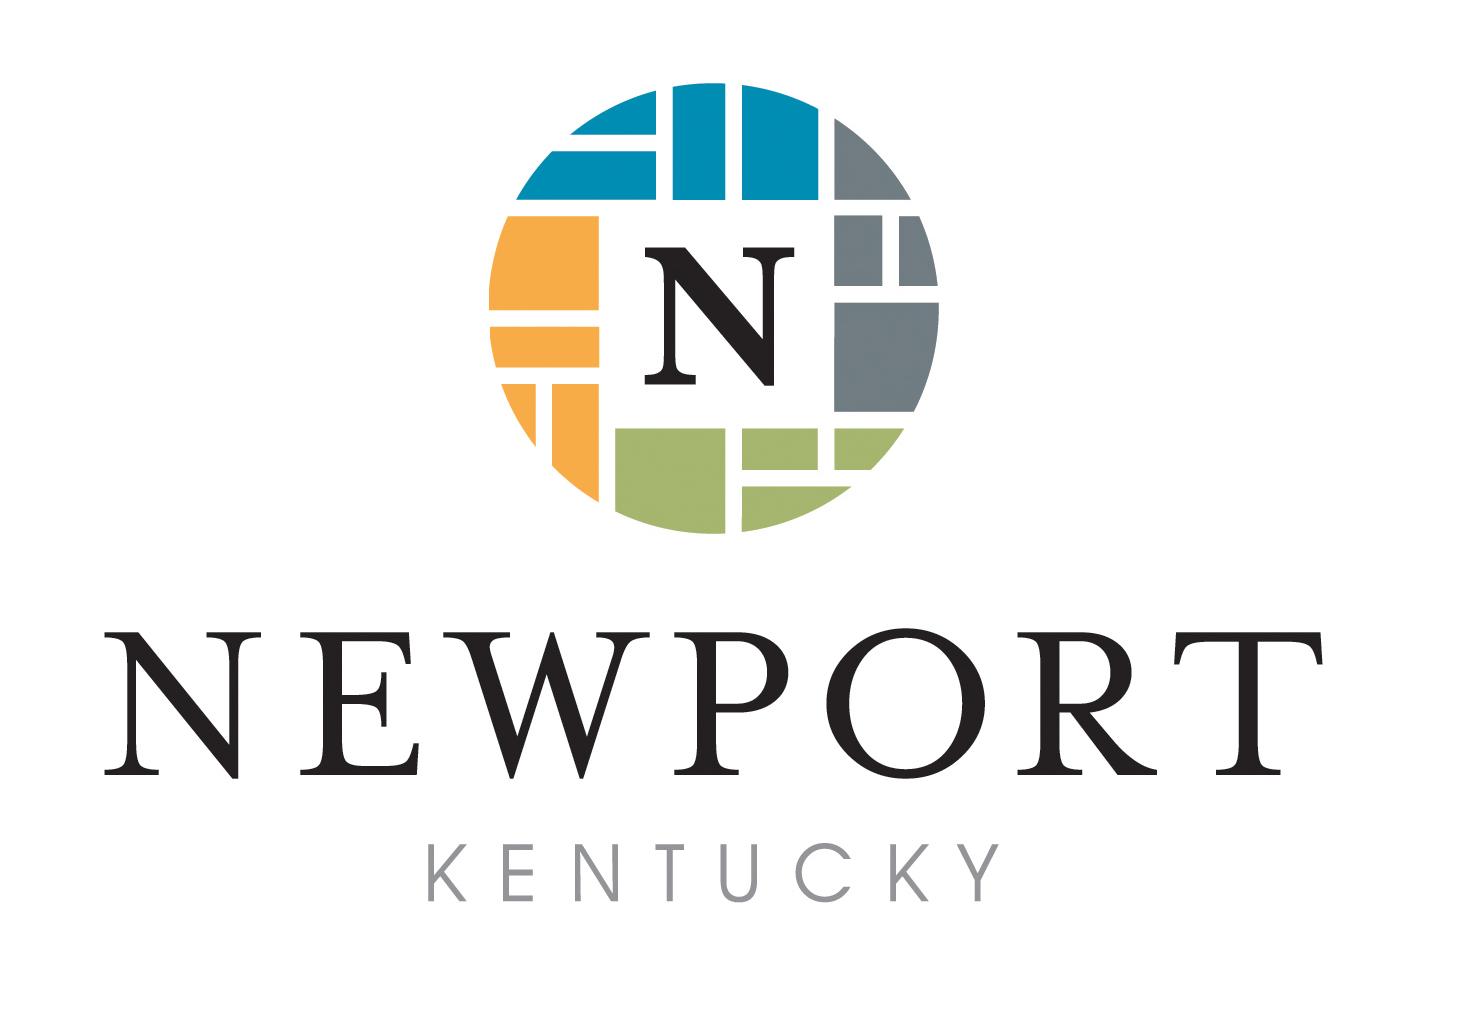 Newportlogo_FINAL%20(002).jpg